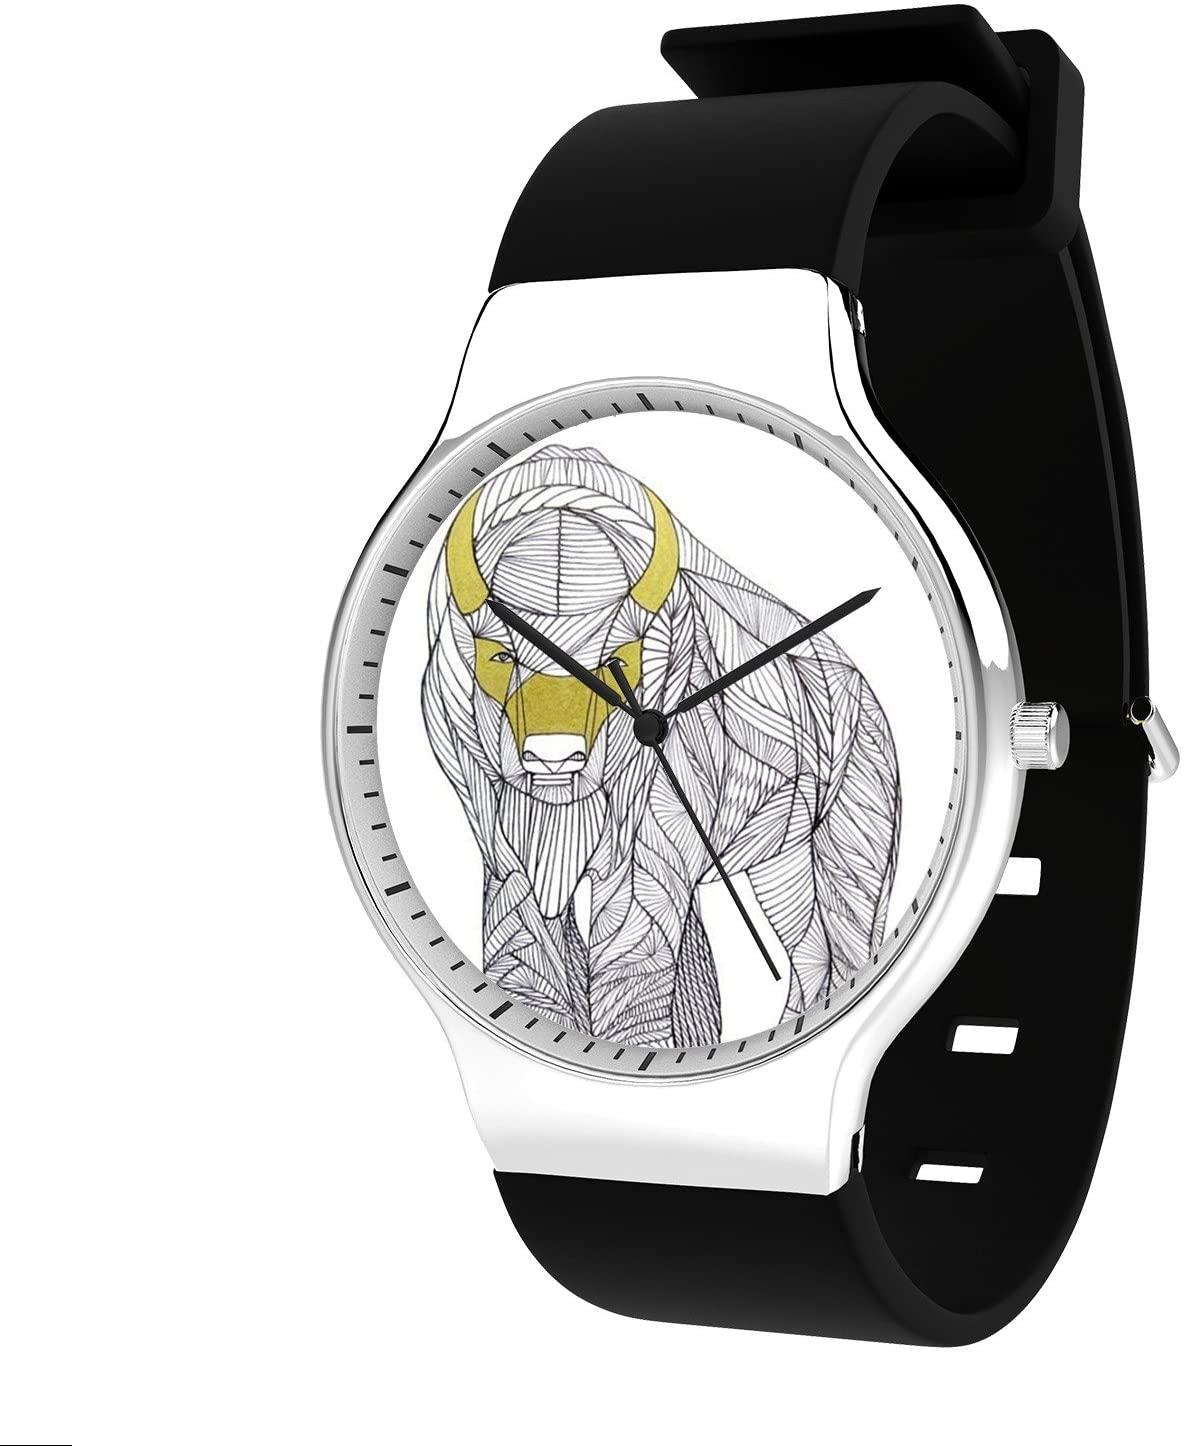 Modern Unisex Wrist Watch, Minimalist Fashion Waterproof Watches Simple Silicone Band Dress Watches for Business Men (Buffalo)